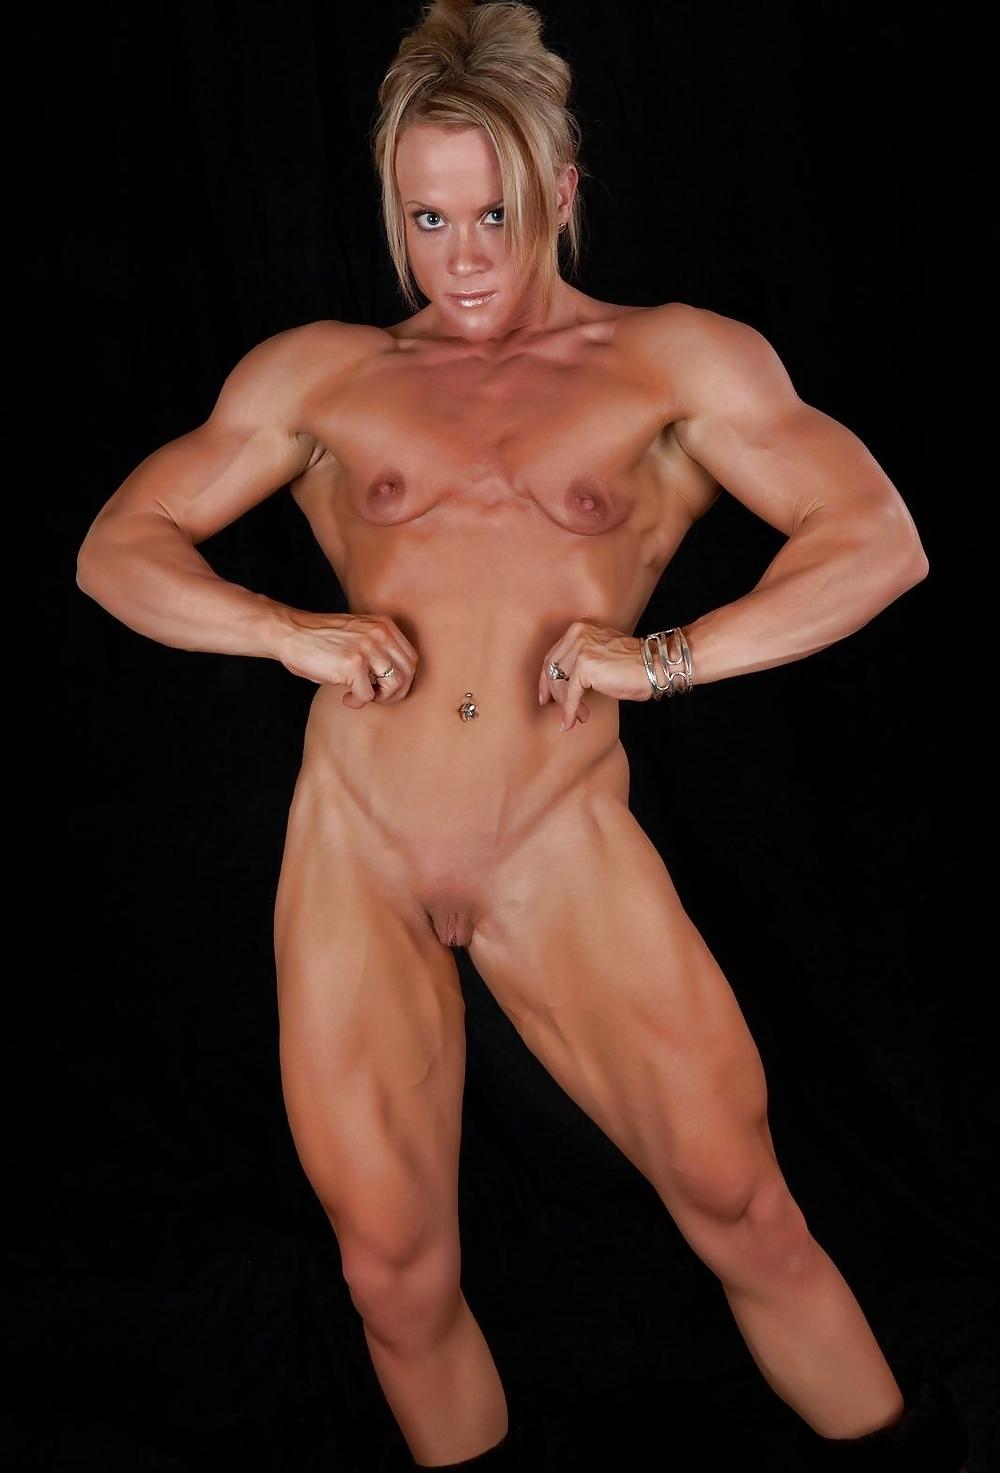 Muscular shape nude female bodybuilding sexy fitness women